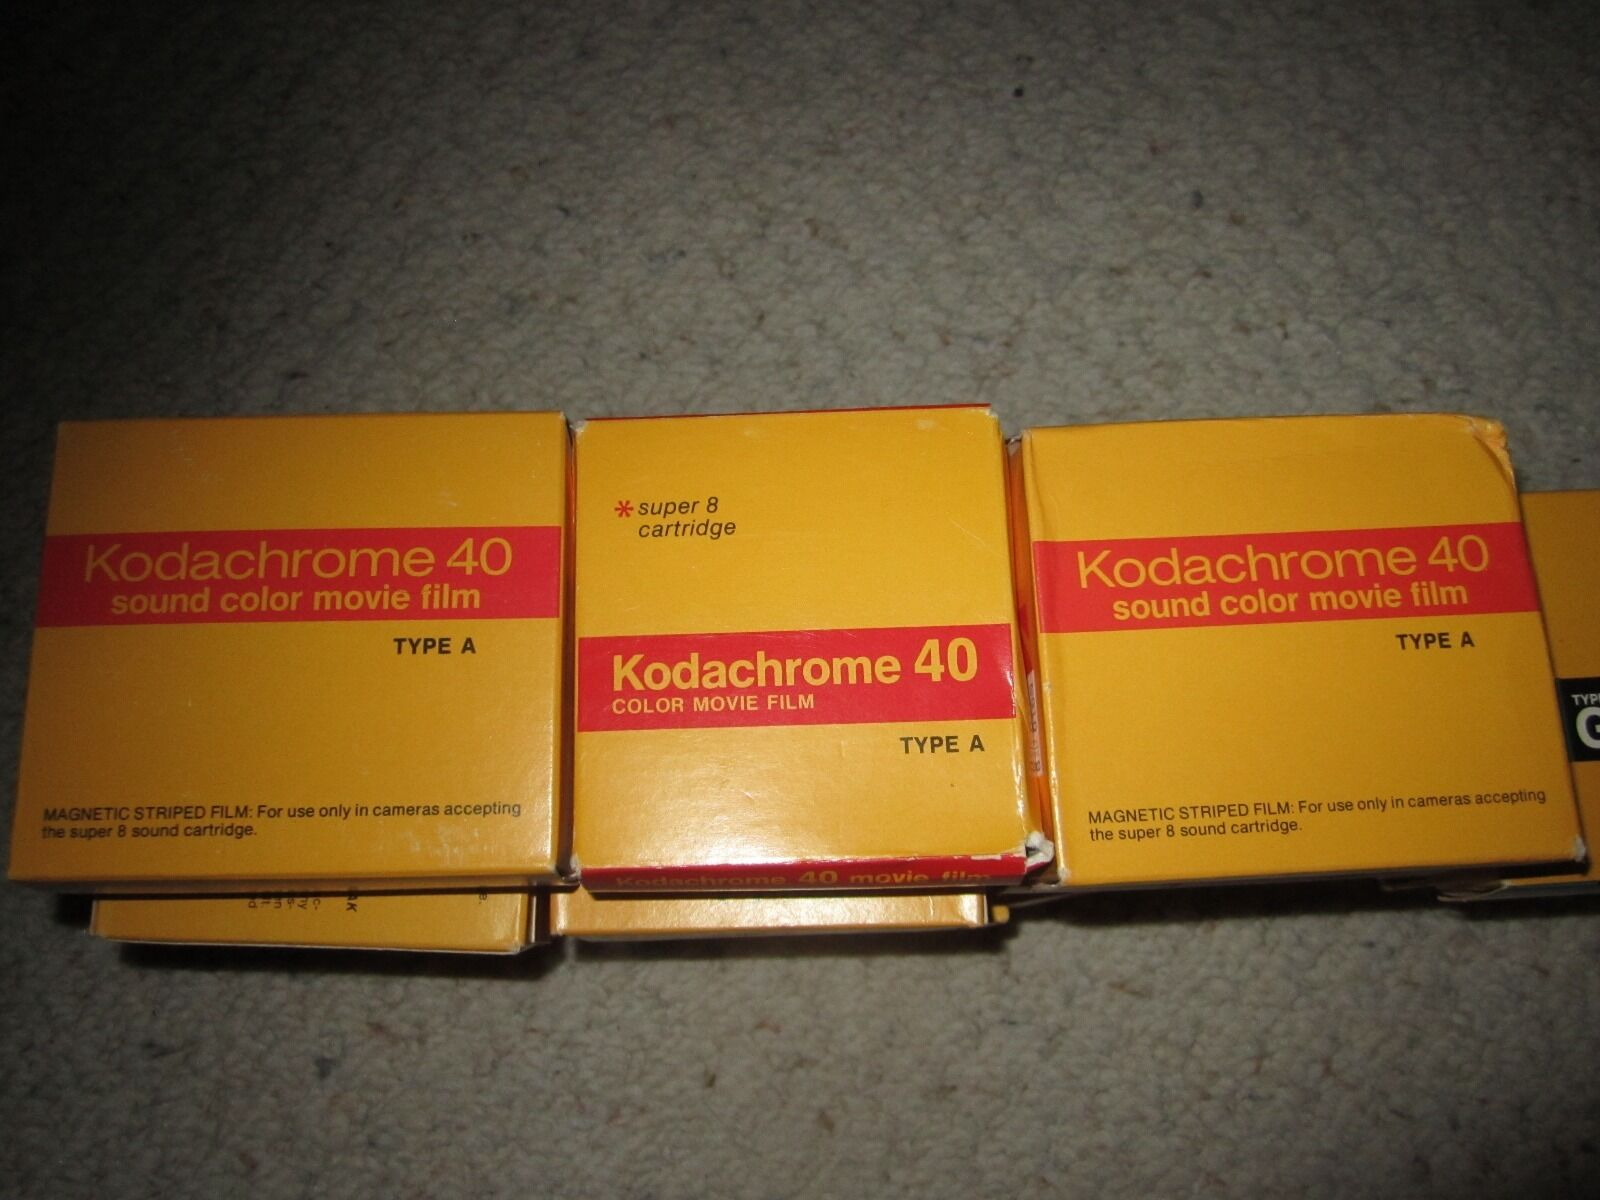 Kodak Super 8 Film Ektachrome K160-85 Boxes&Kodachrome K40-90 Boxes PRICE  PERBOX купить на eBay с доставкой в Украину ➤ OrderWorld